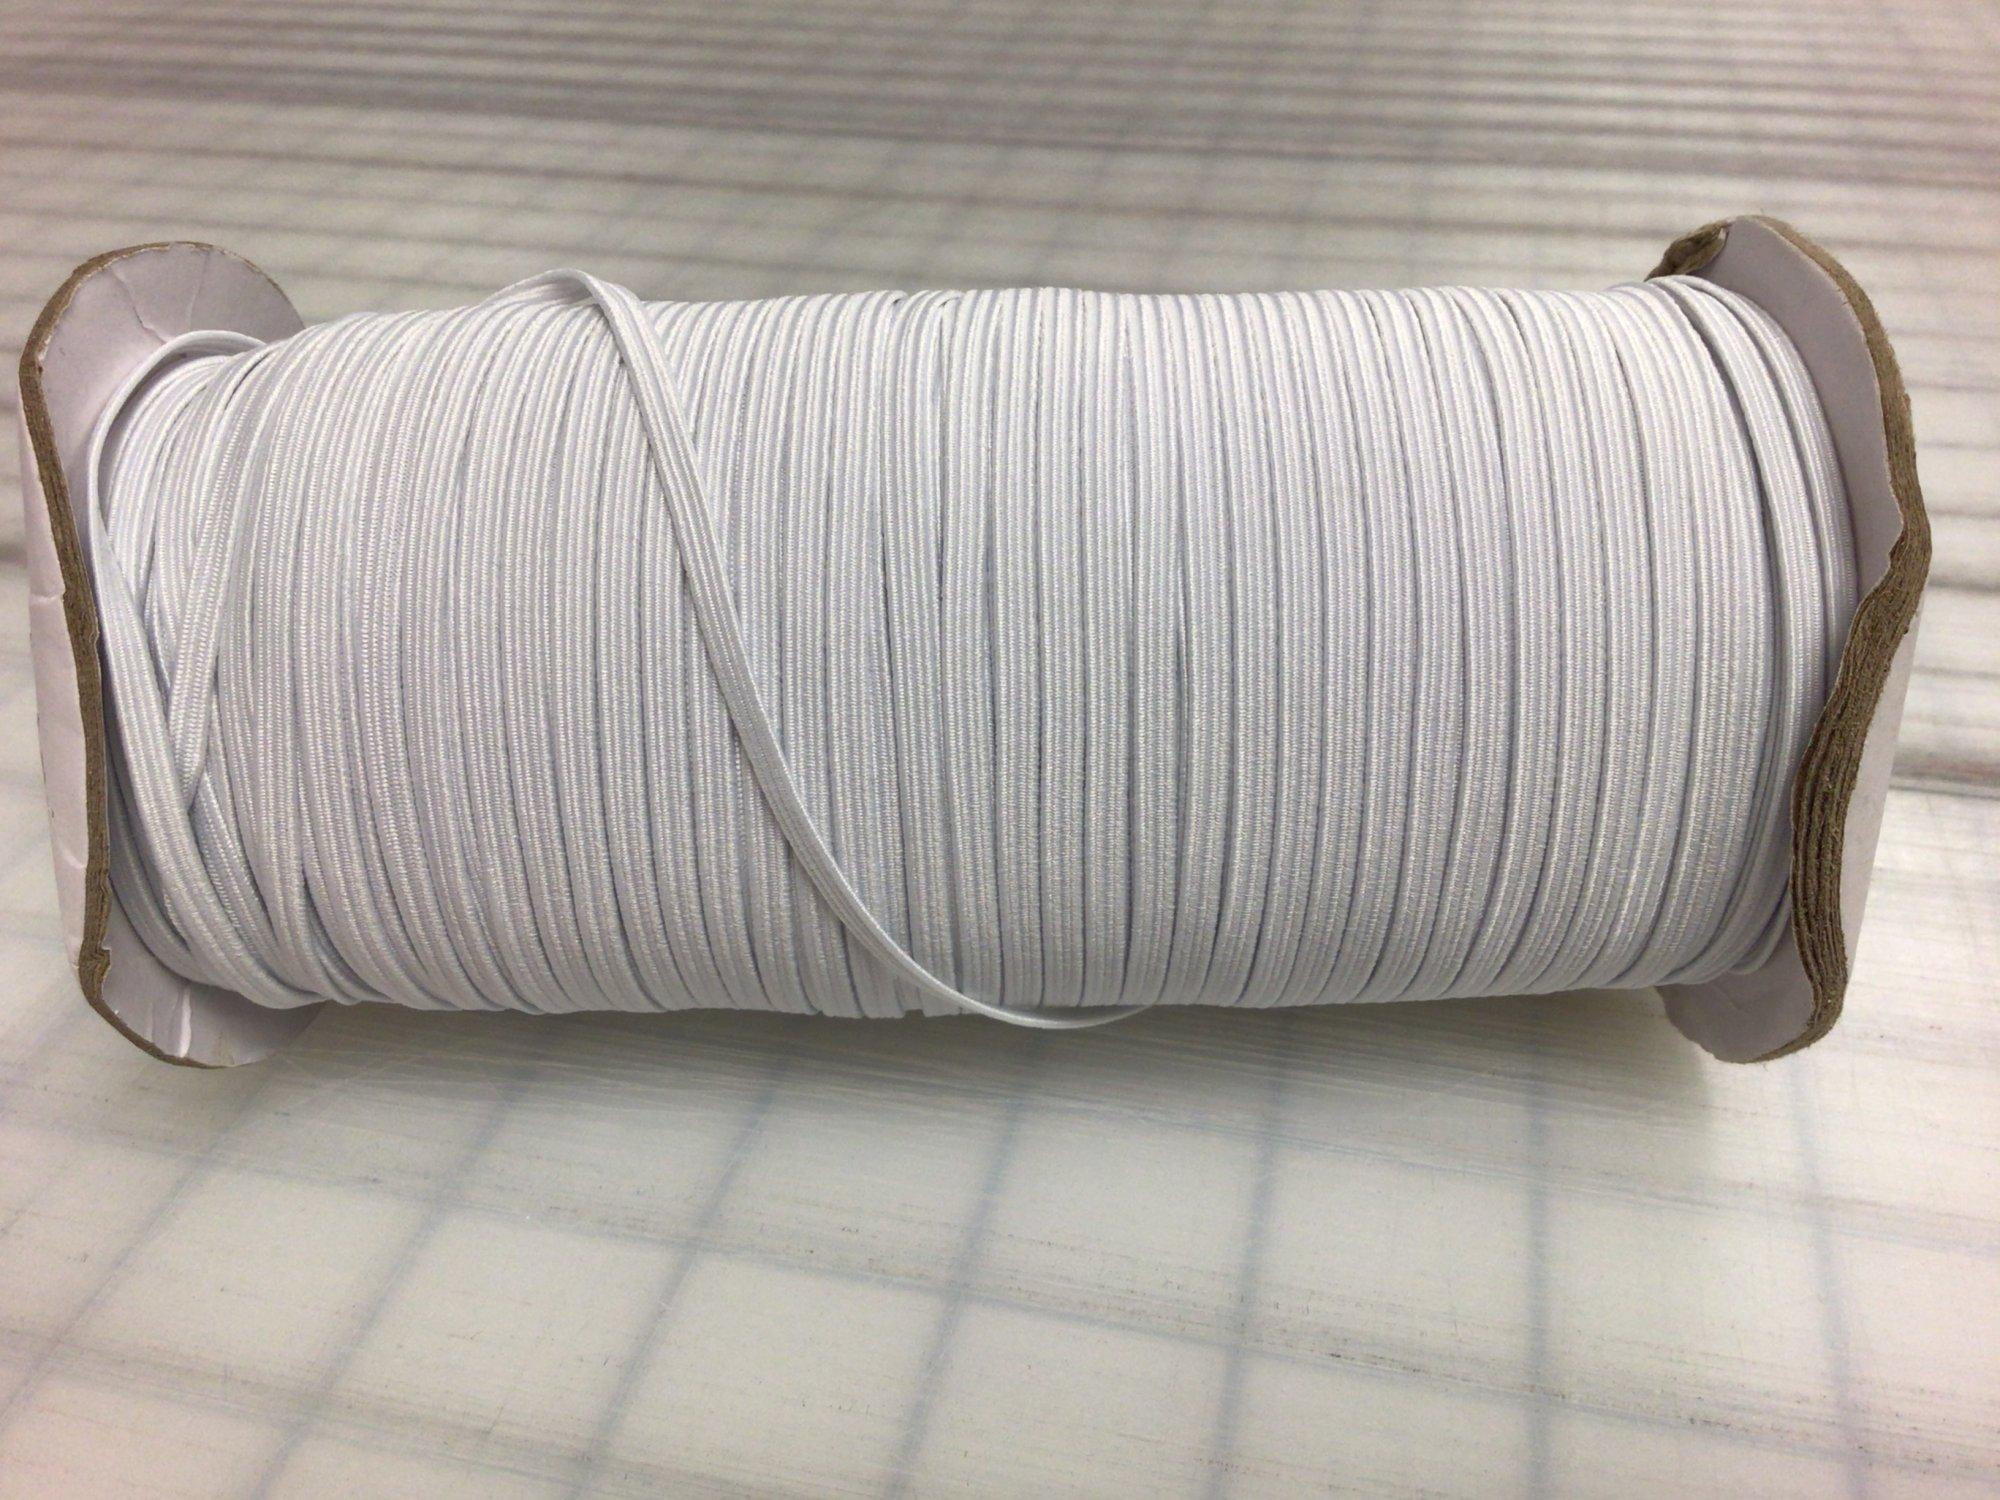 Elastic - White - 3mm/.12in